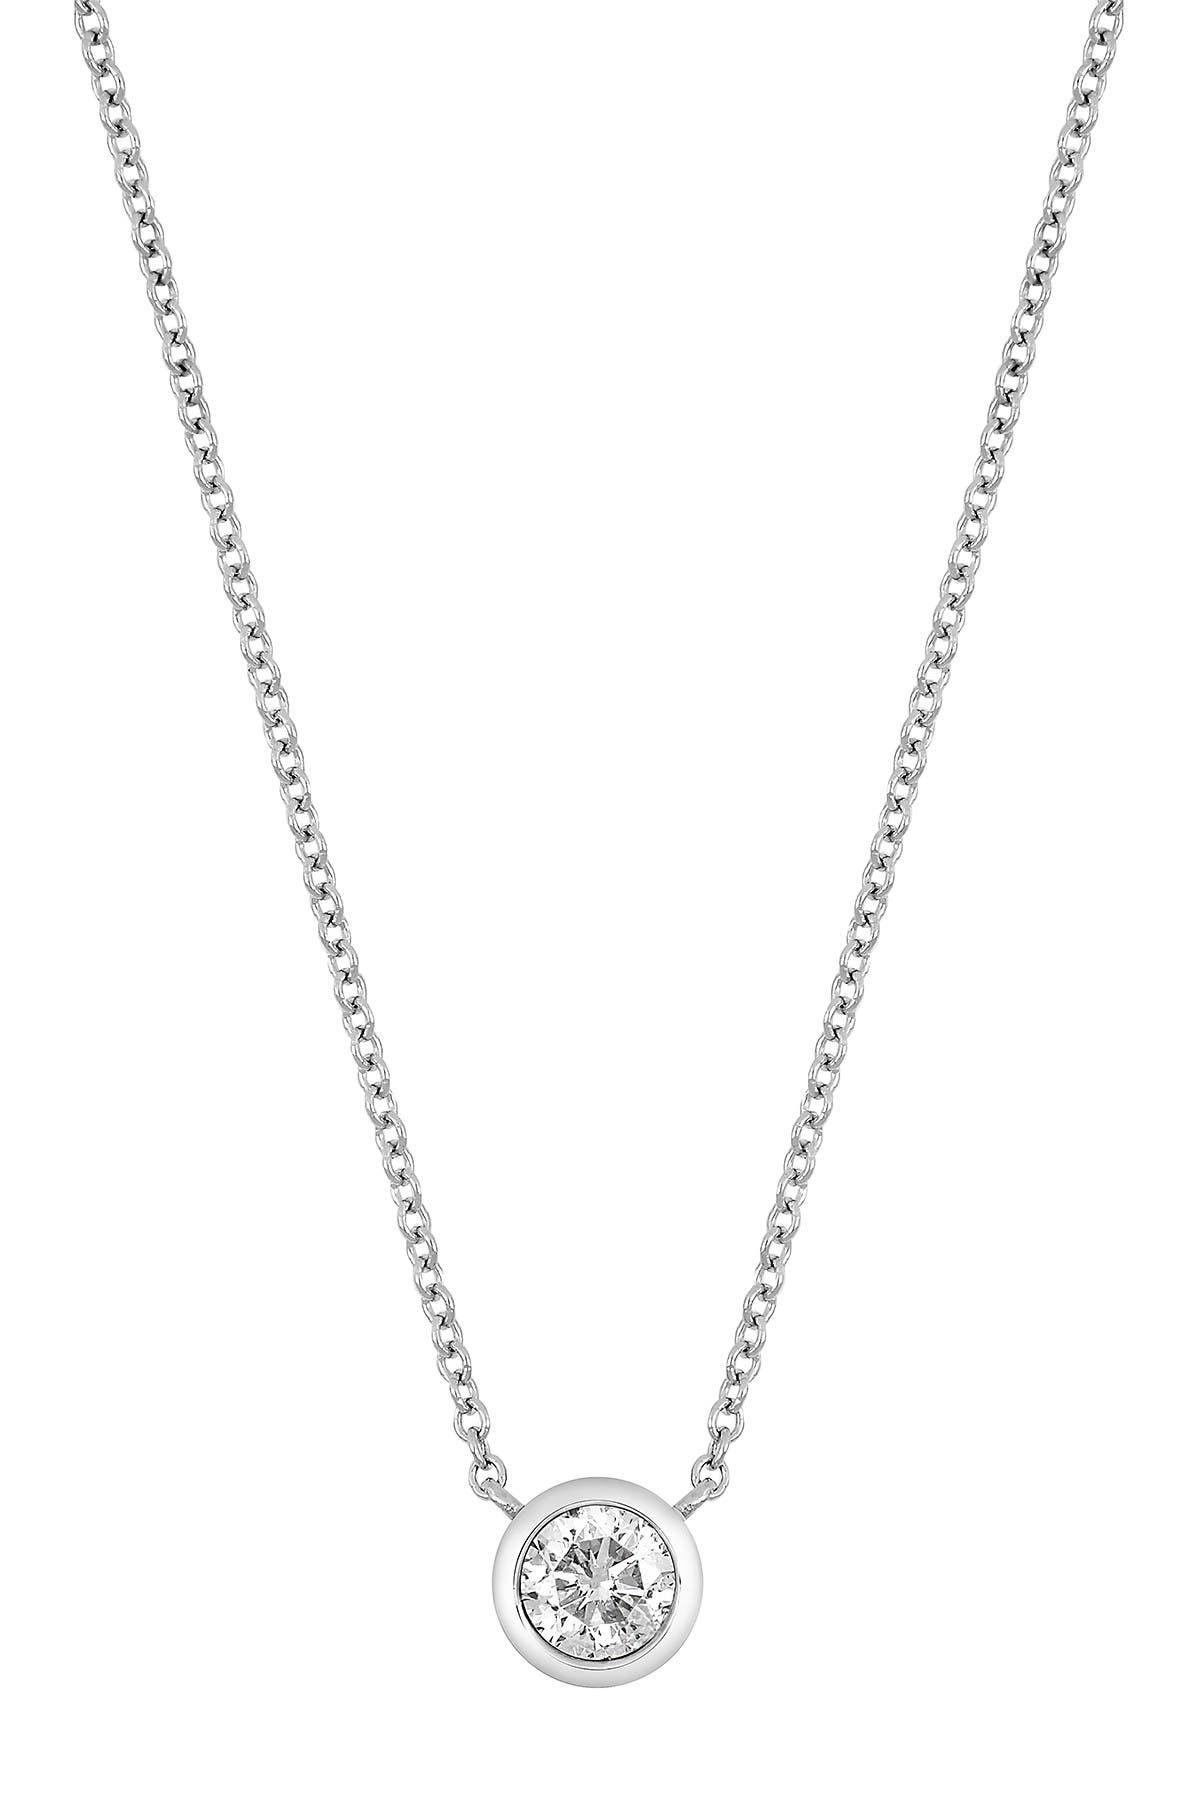 Image of Bony Levy 14K Gold Round-Cut Diamond Pendant Necklace - 0.37 ctw